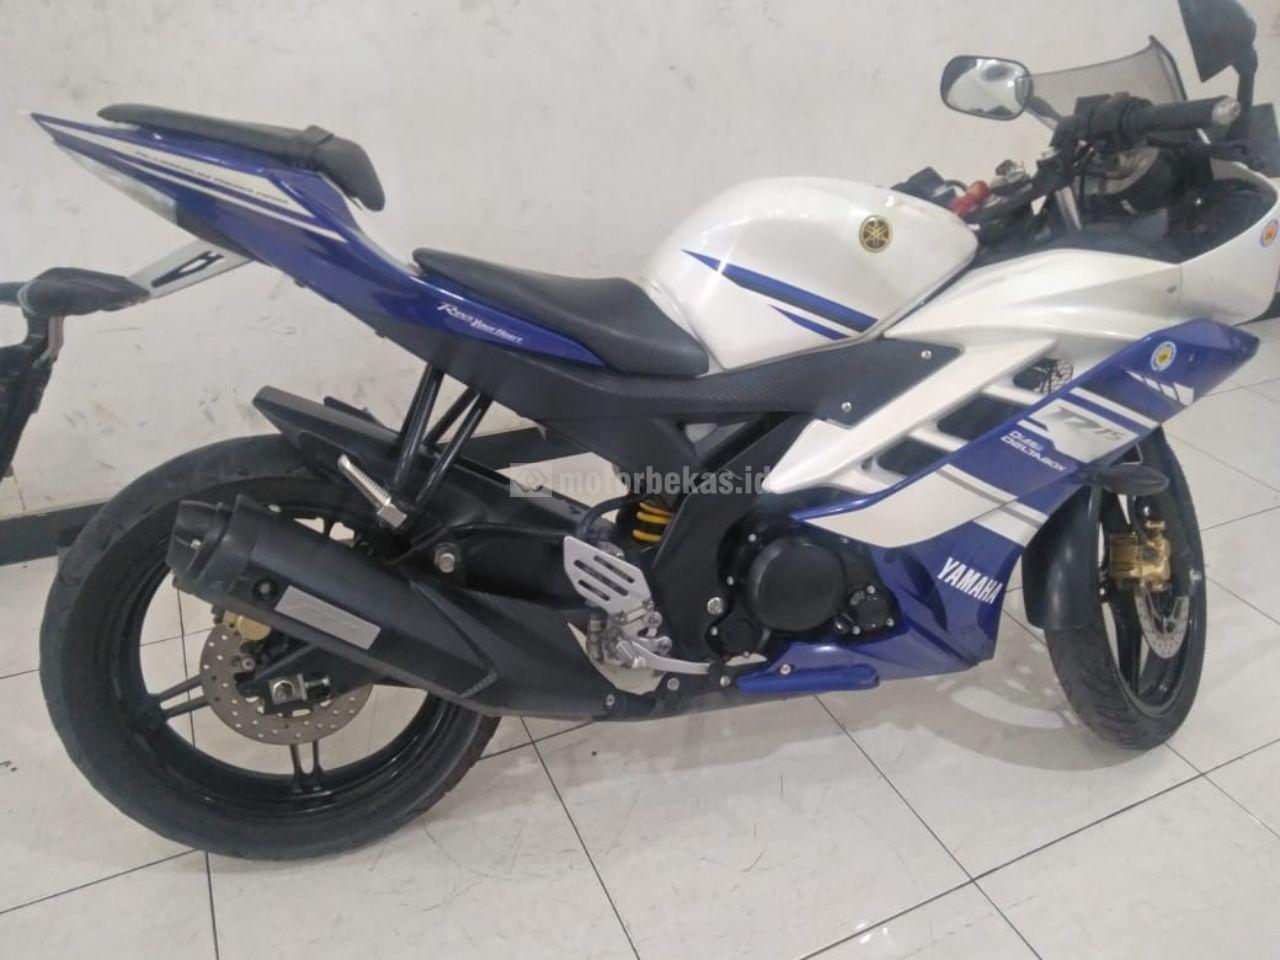 YAMAHA R15  1234 motorbekas.id